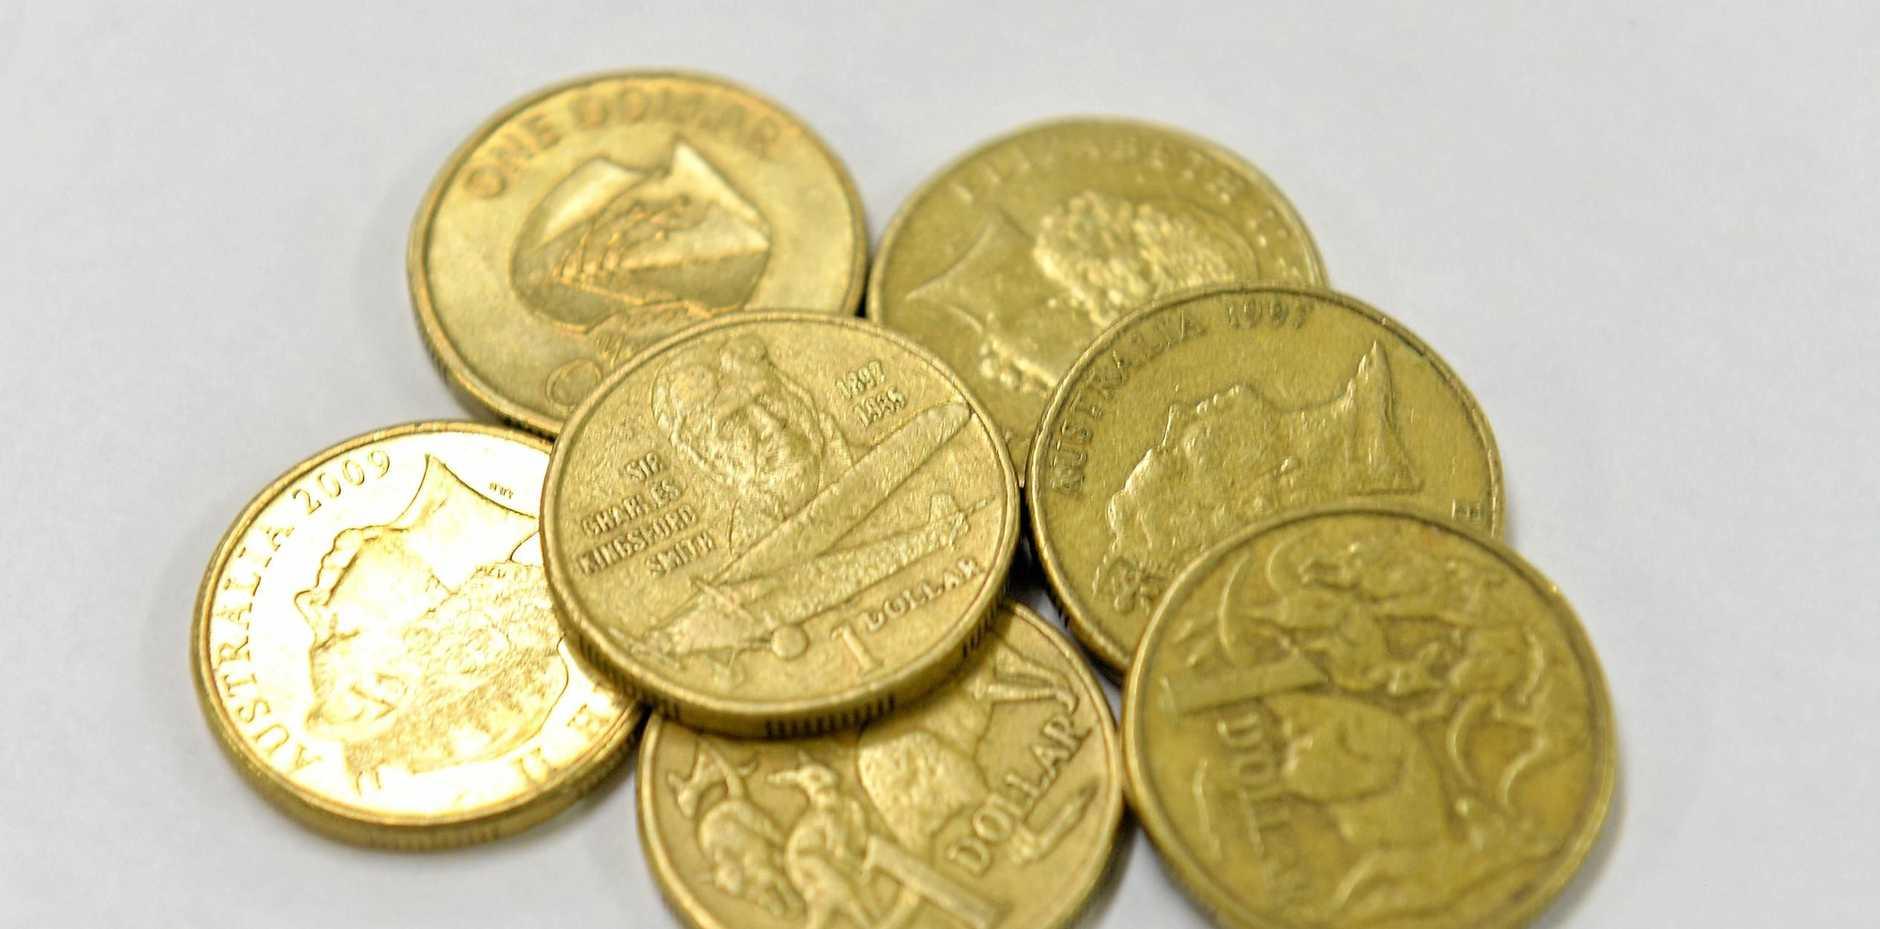 $1 one dollar coins